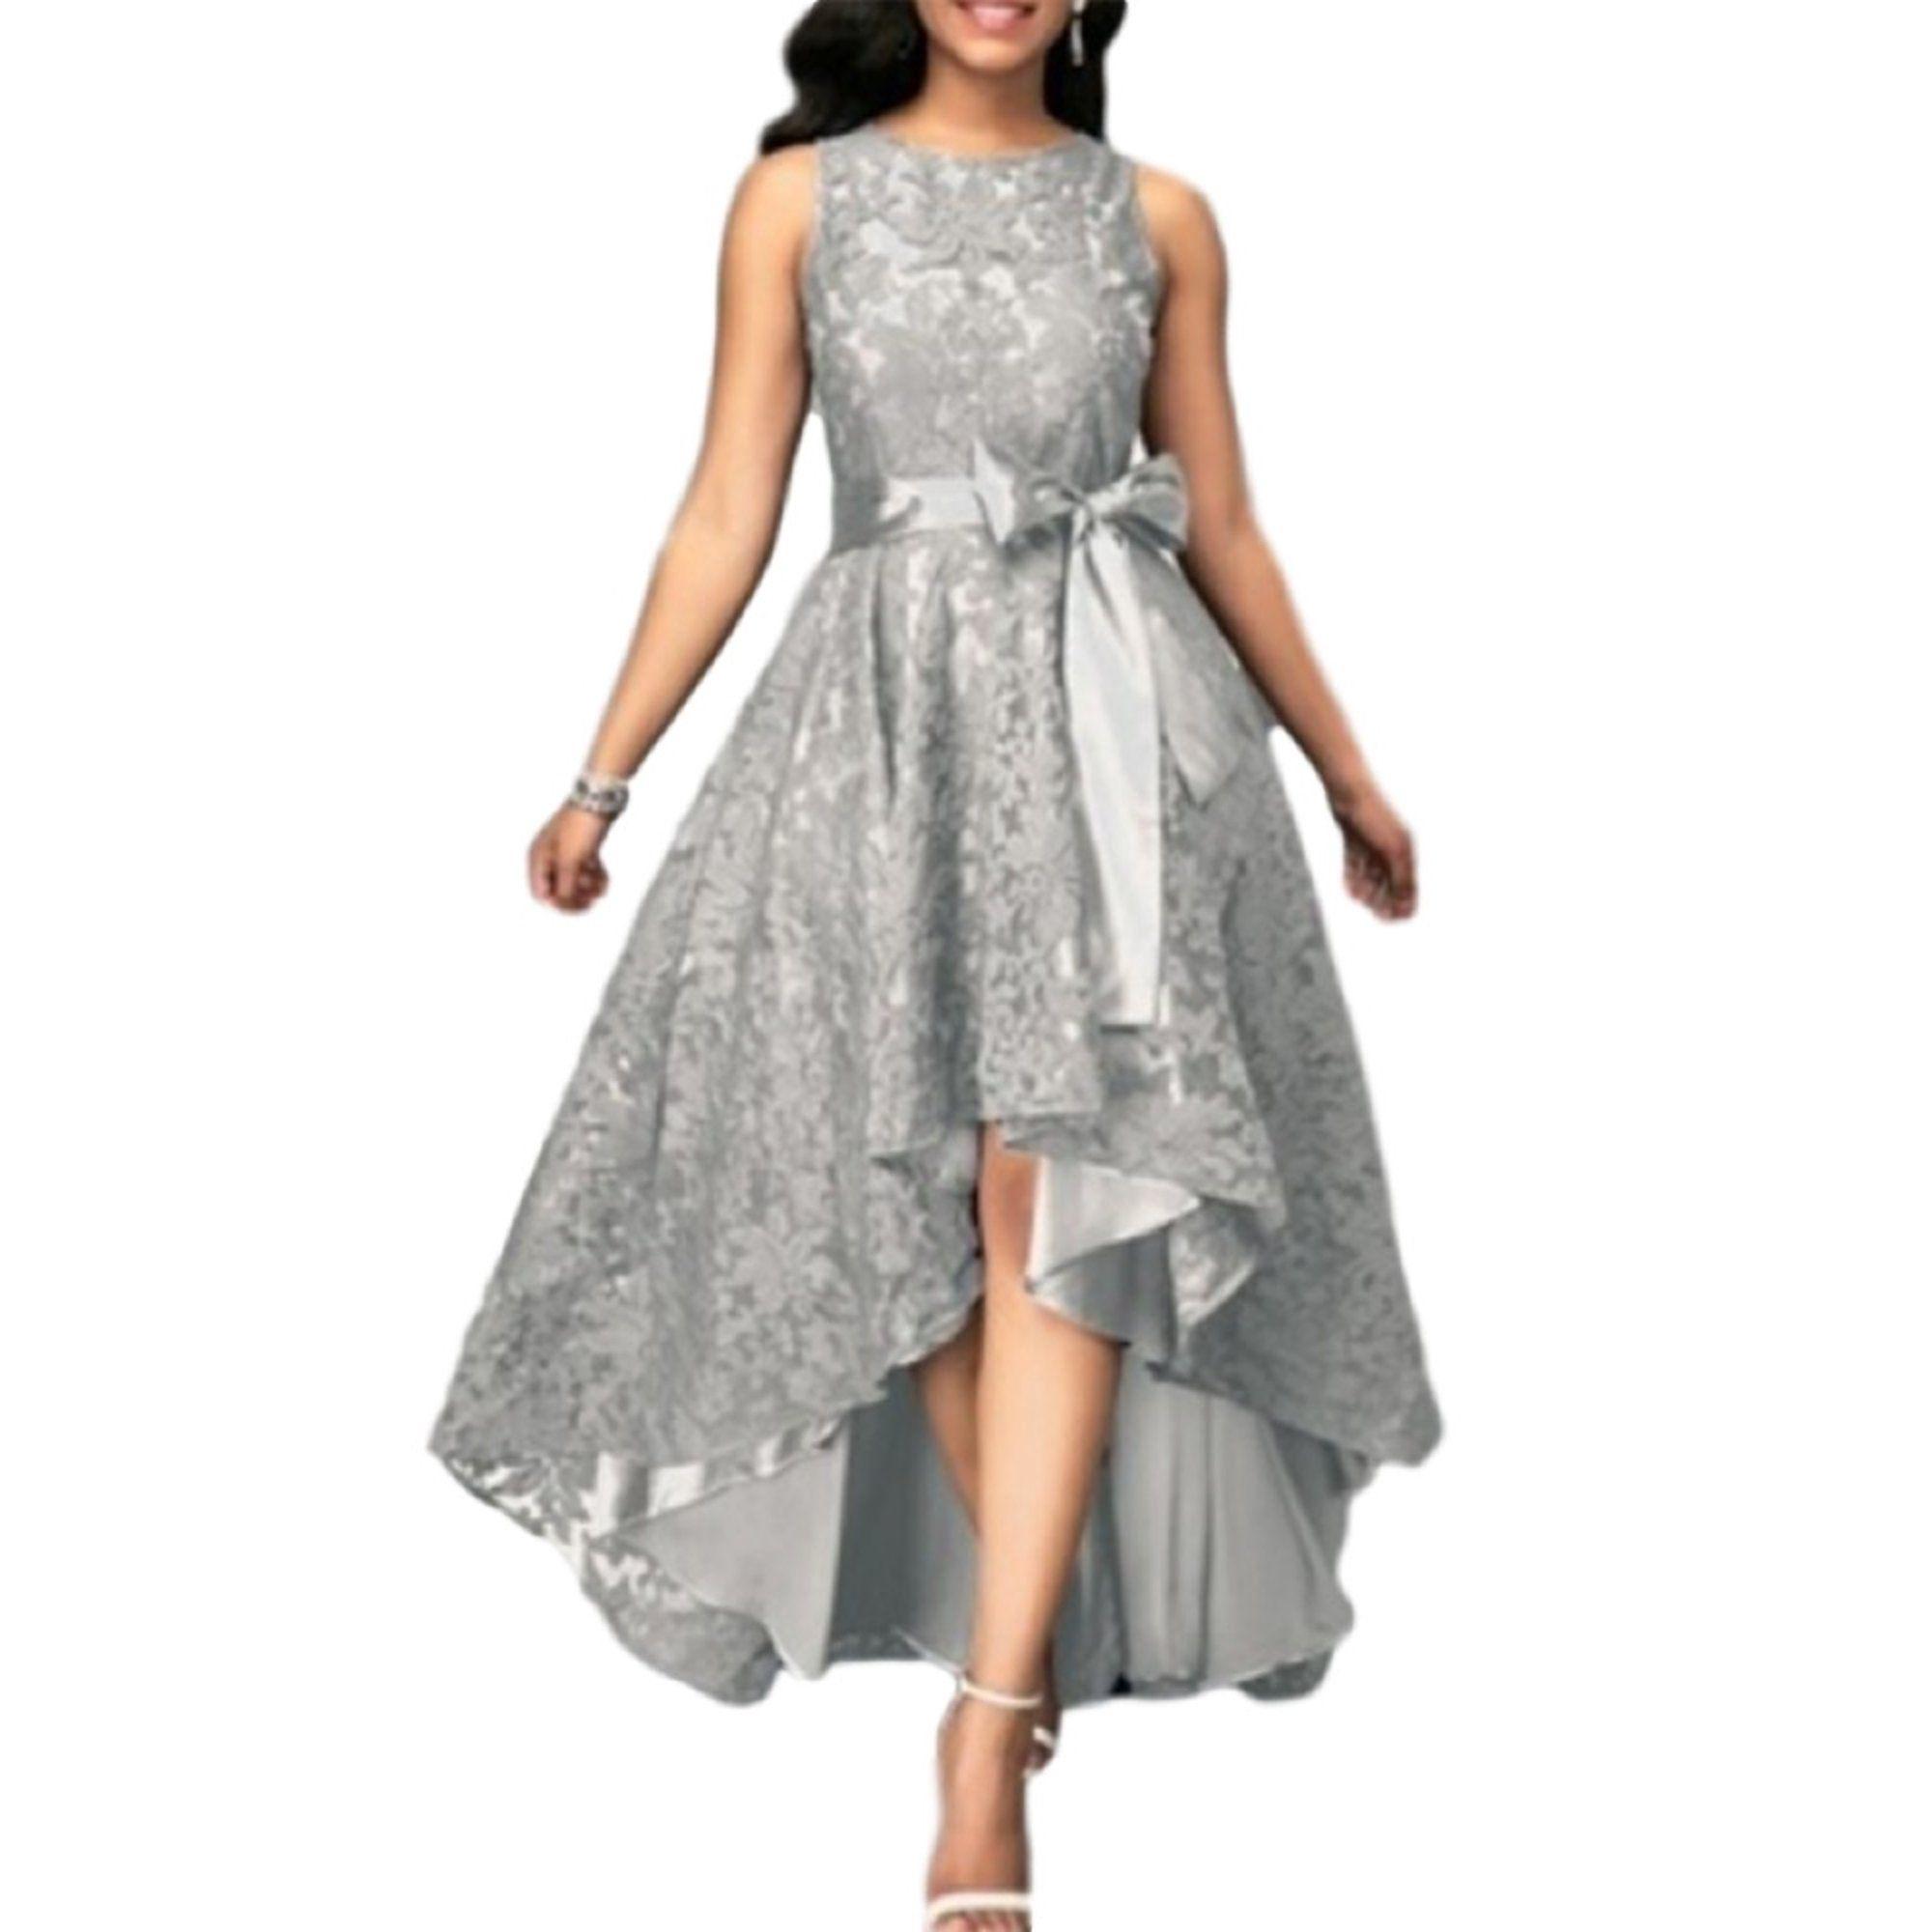 Sysea Sleeveless Women Lace Party Dress Irregular Dresses Walmart Com Walmart Com Lace Party Dresses High Low Lace Dress Belted Lace Dress [ 2000 x 2000 Pixel ]